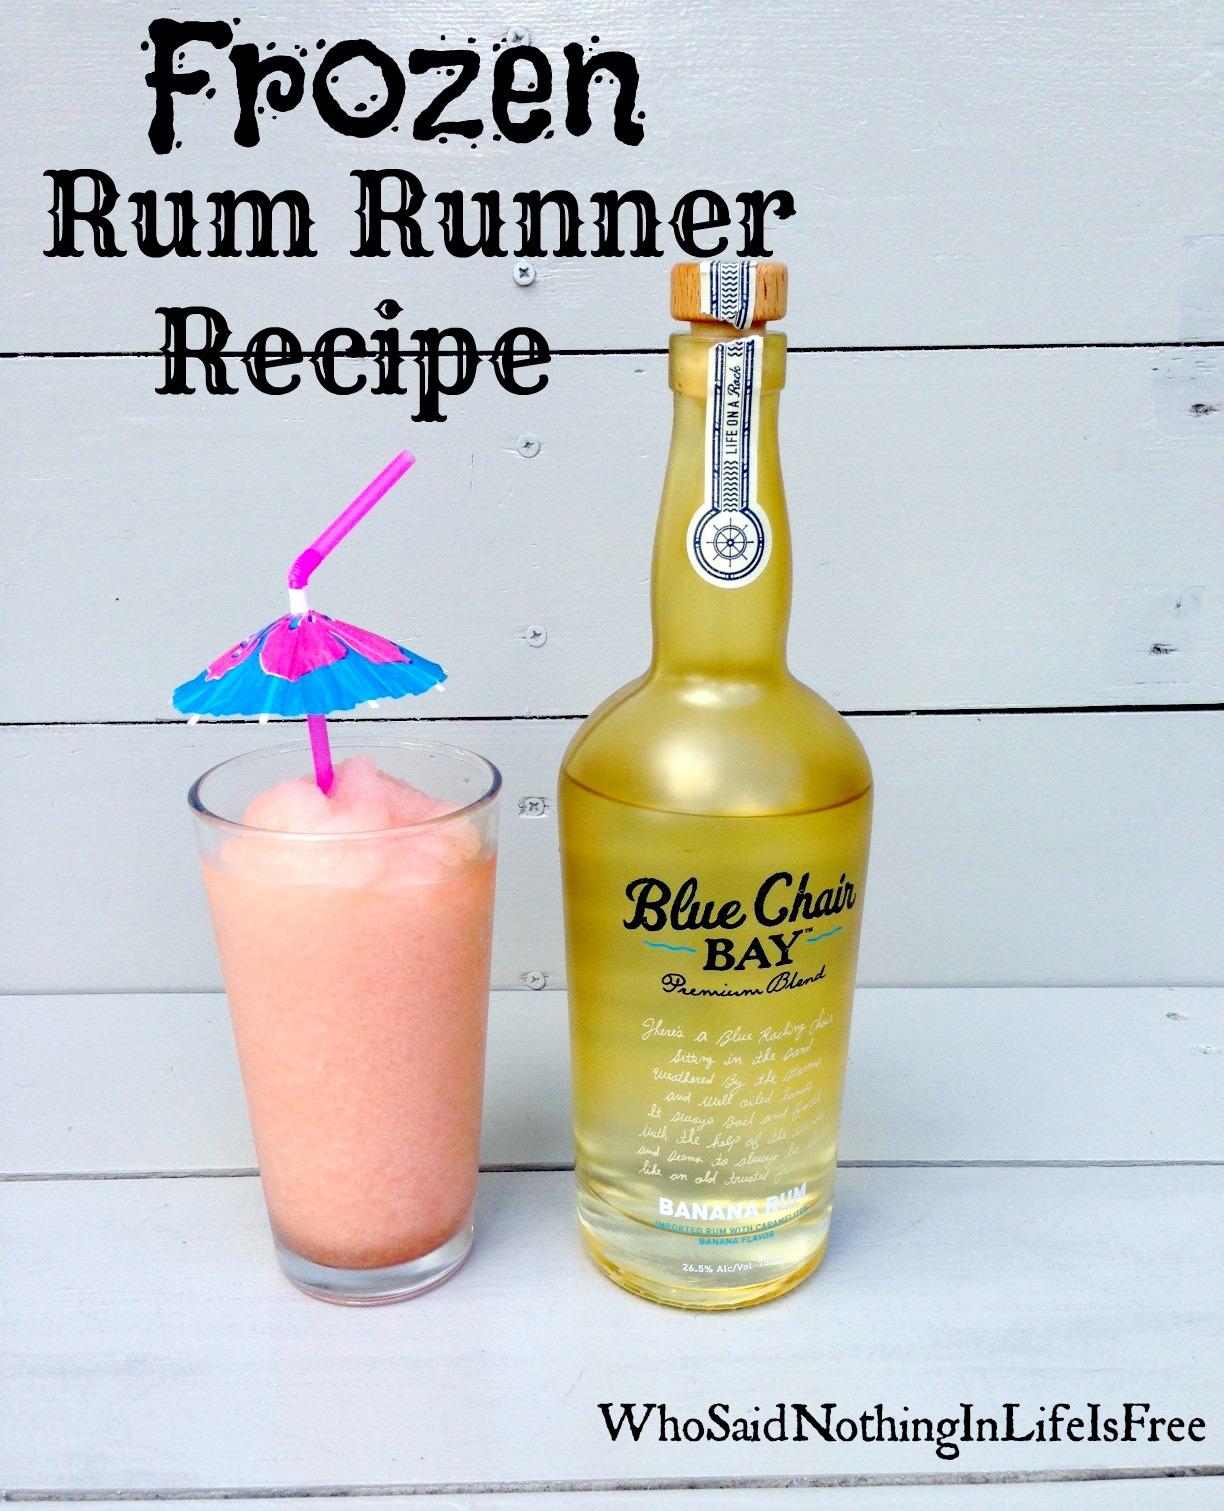 blue chair rum stool big w frozen runner recipe bay banana